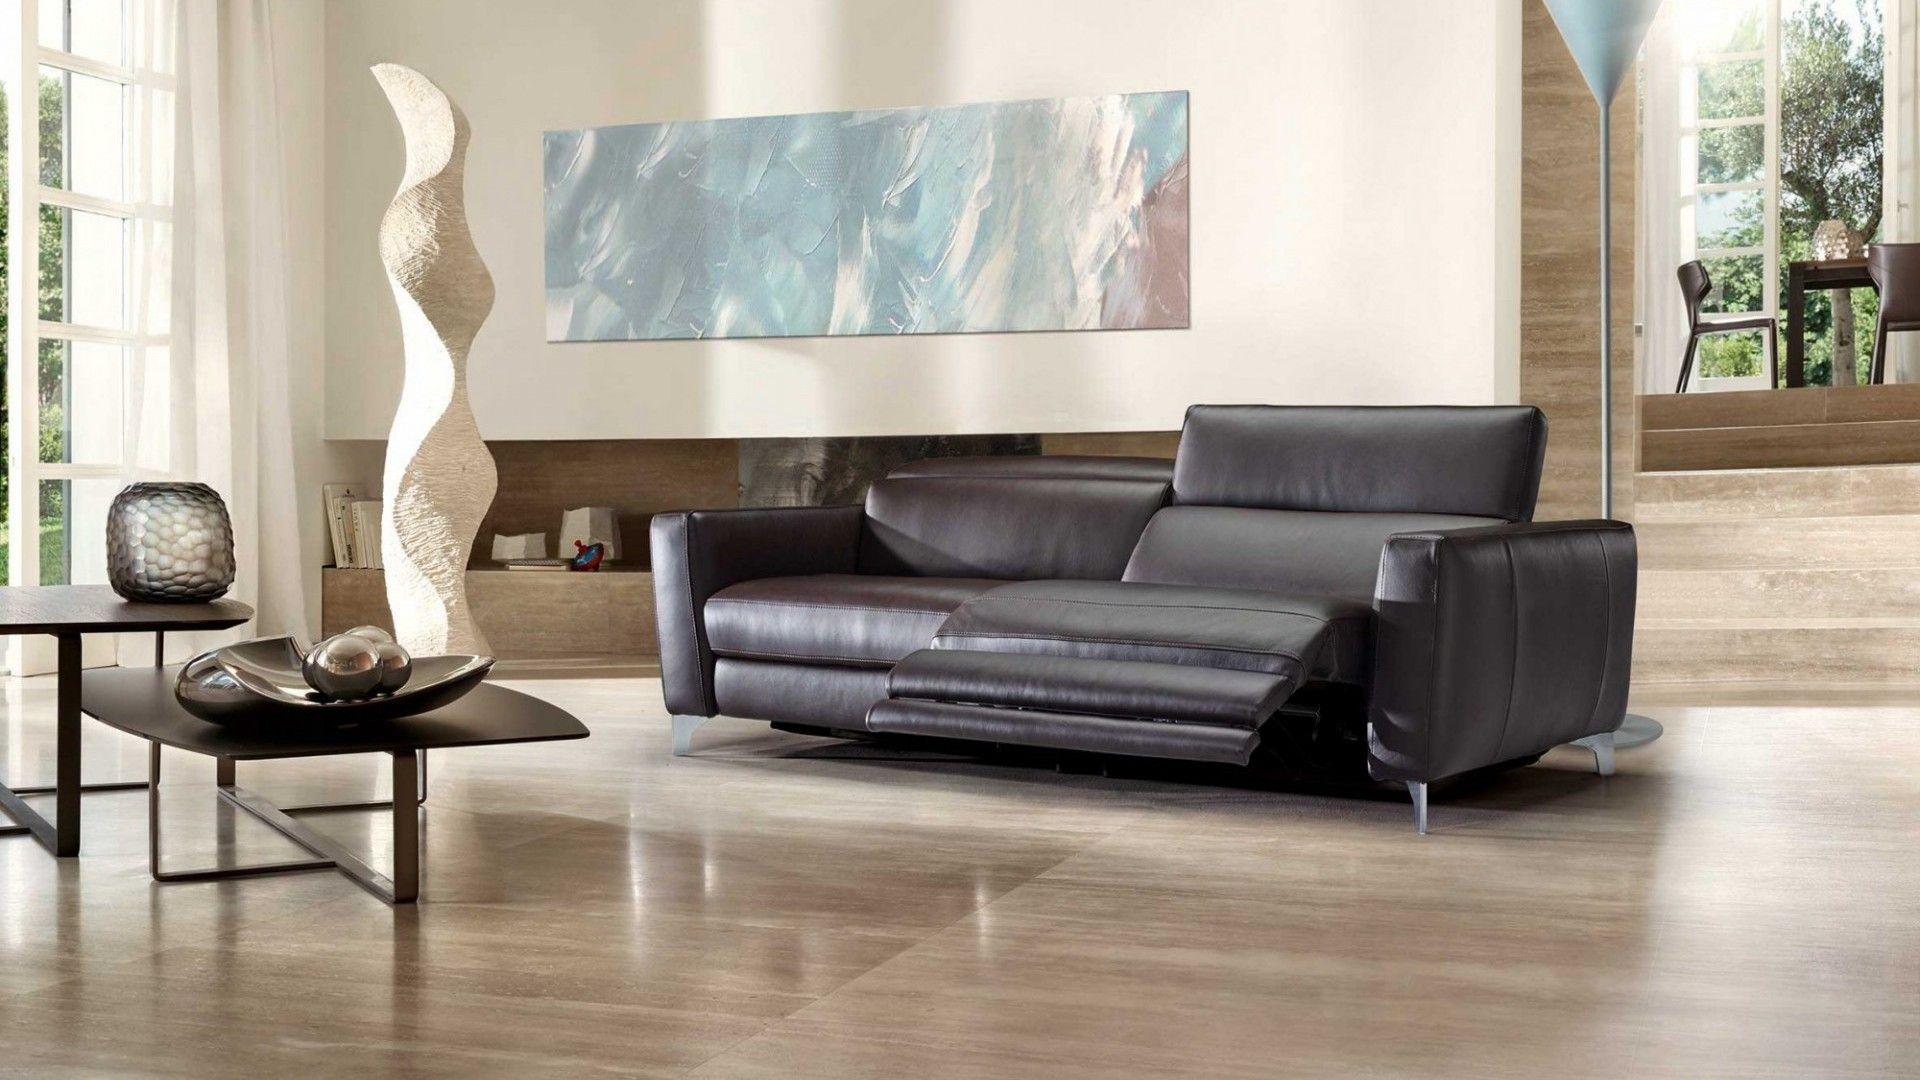 Natuzzi Mobili ~ Natuzzi designed by claudio bellini lem is an invitation to sit